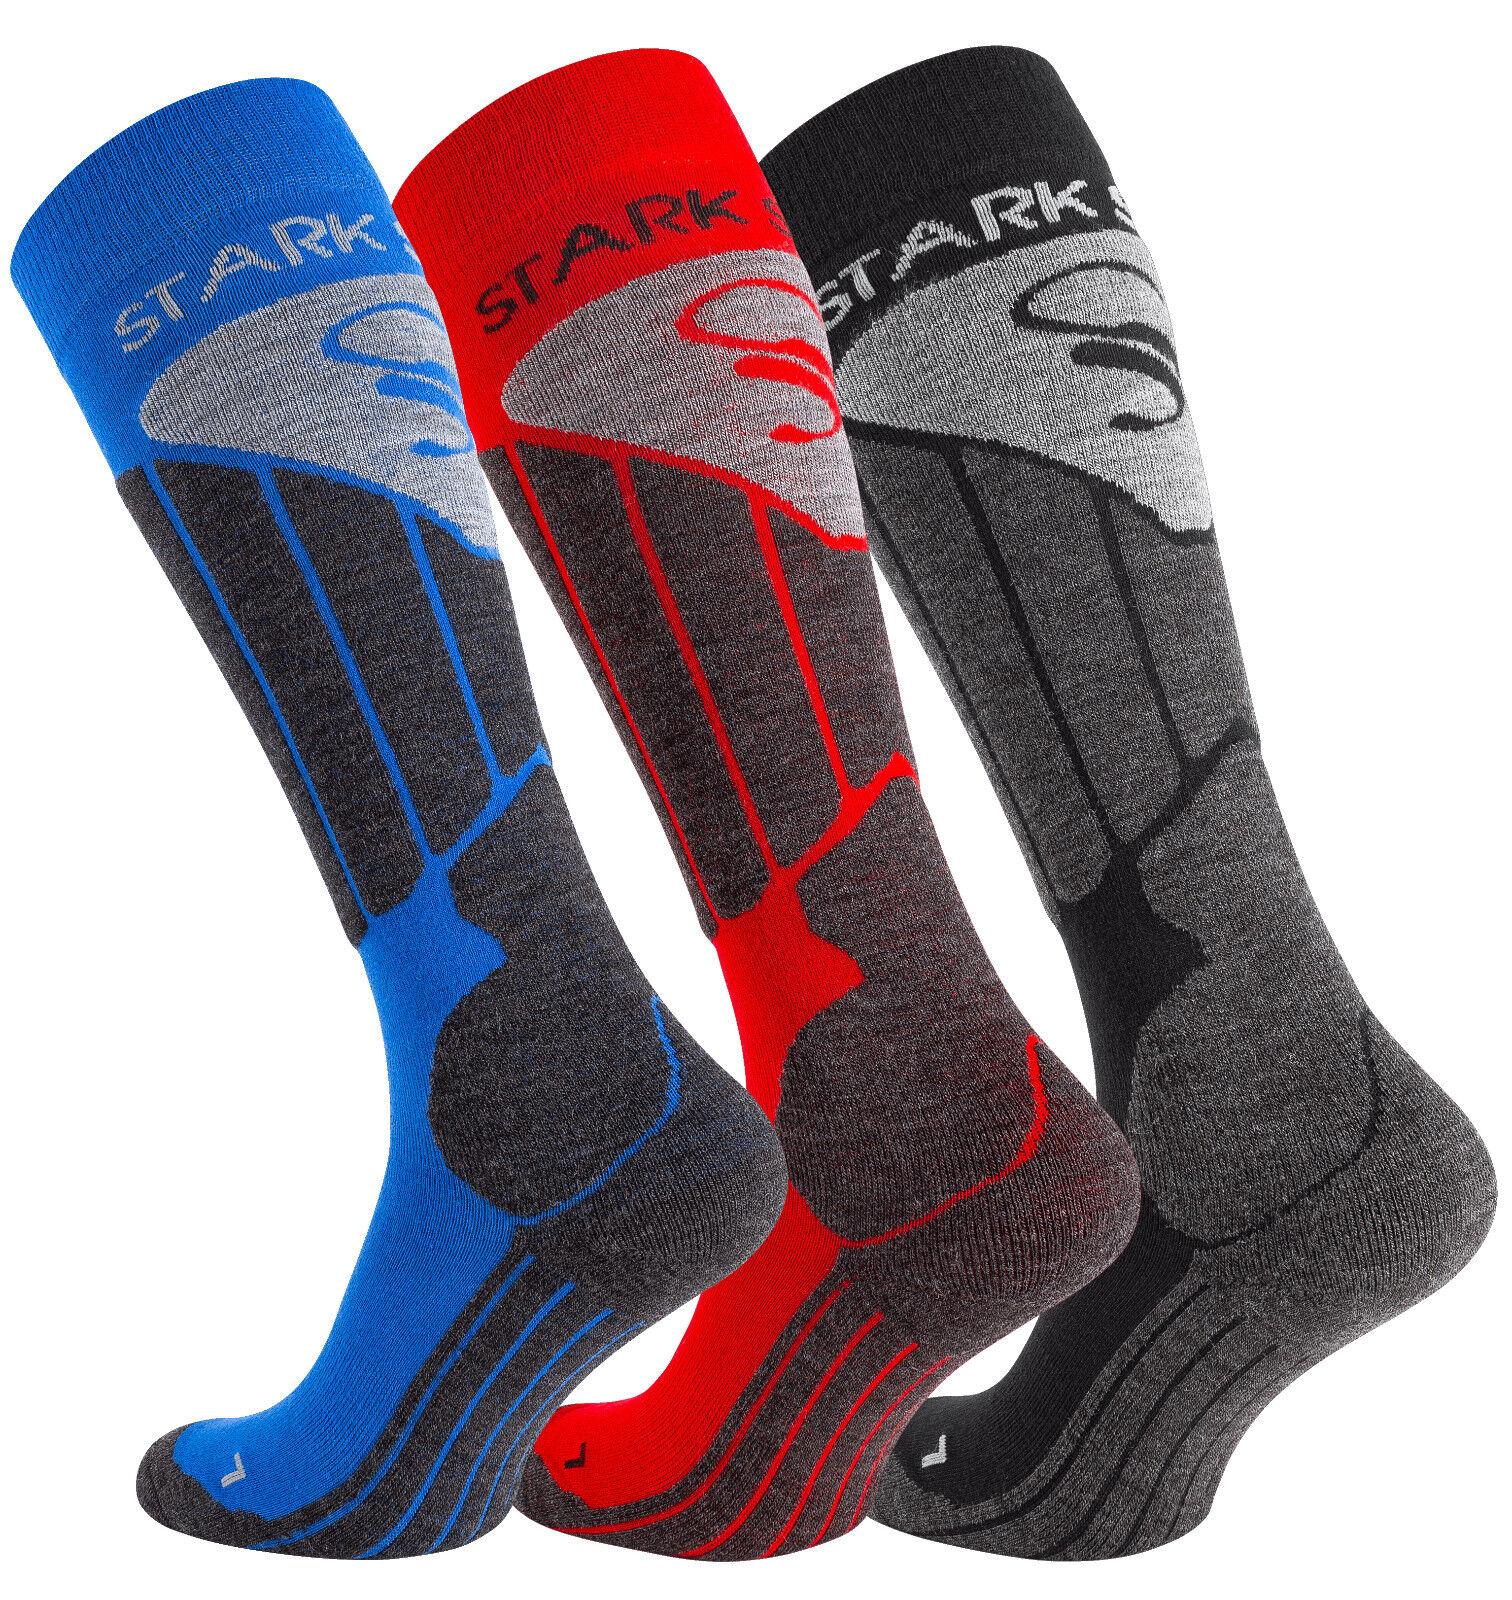 Skisport & Snowboarding Bekleidung Spyder Skisocken Skistrümpfe Dare Socks Sportsocken Herren Farbwahl